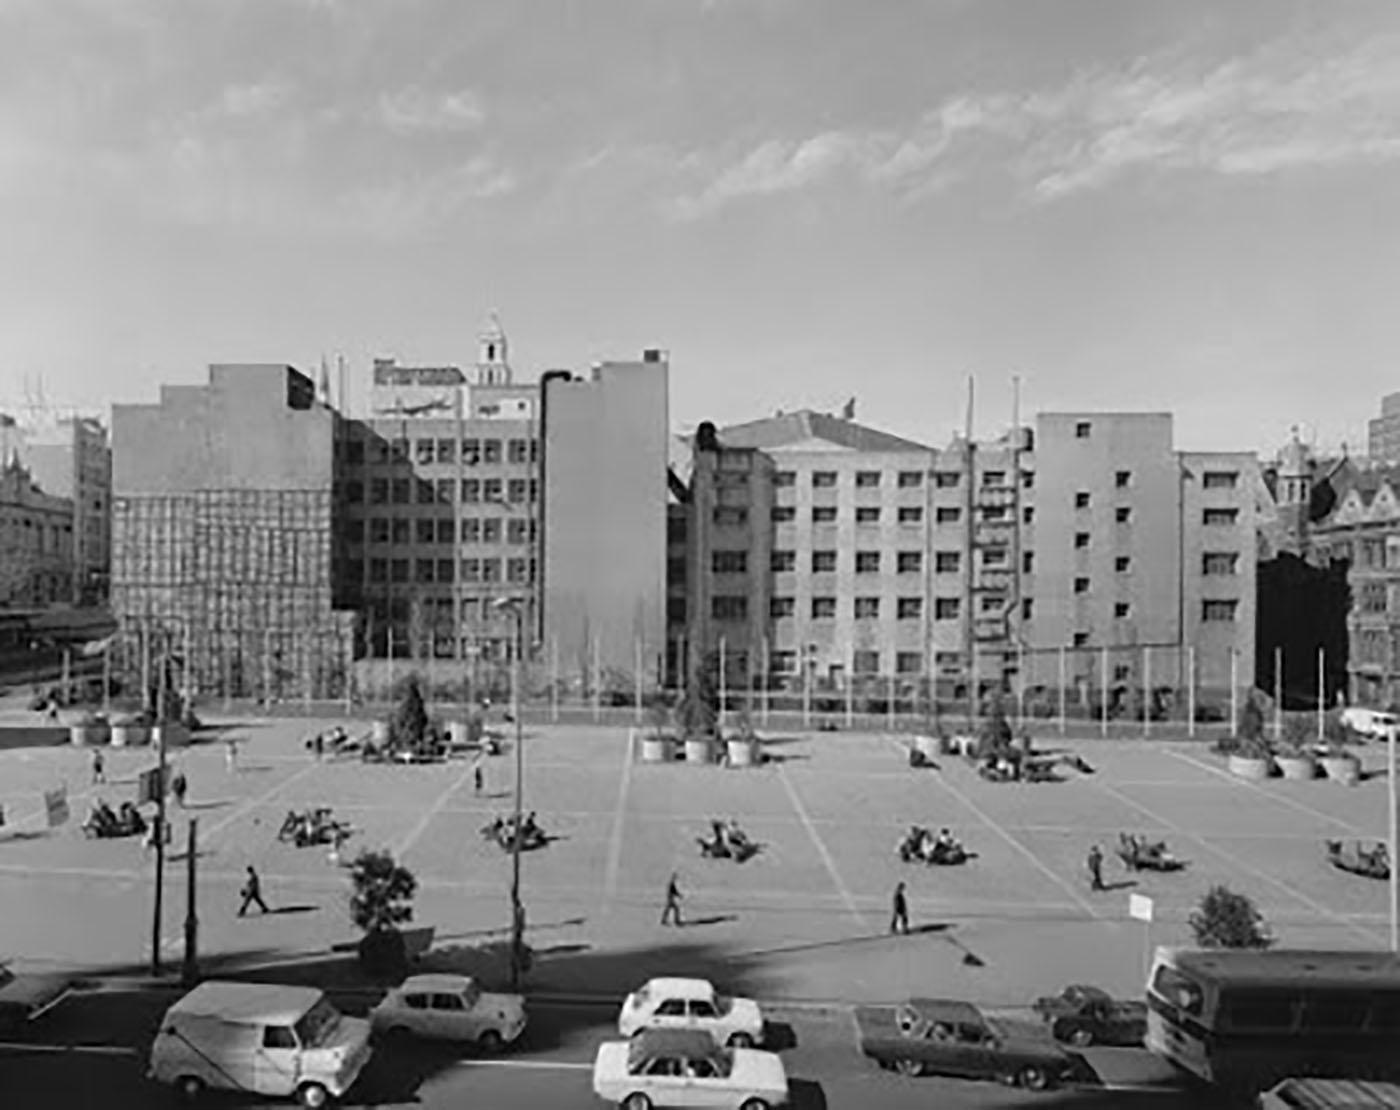 city+square+melbourne+1970.jpg